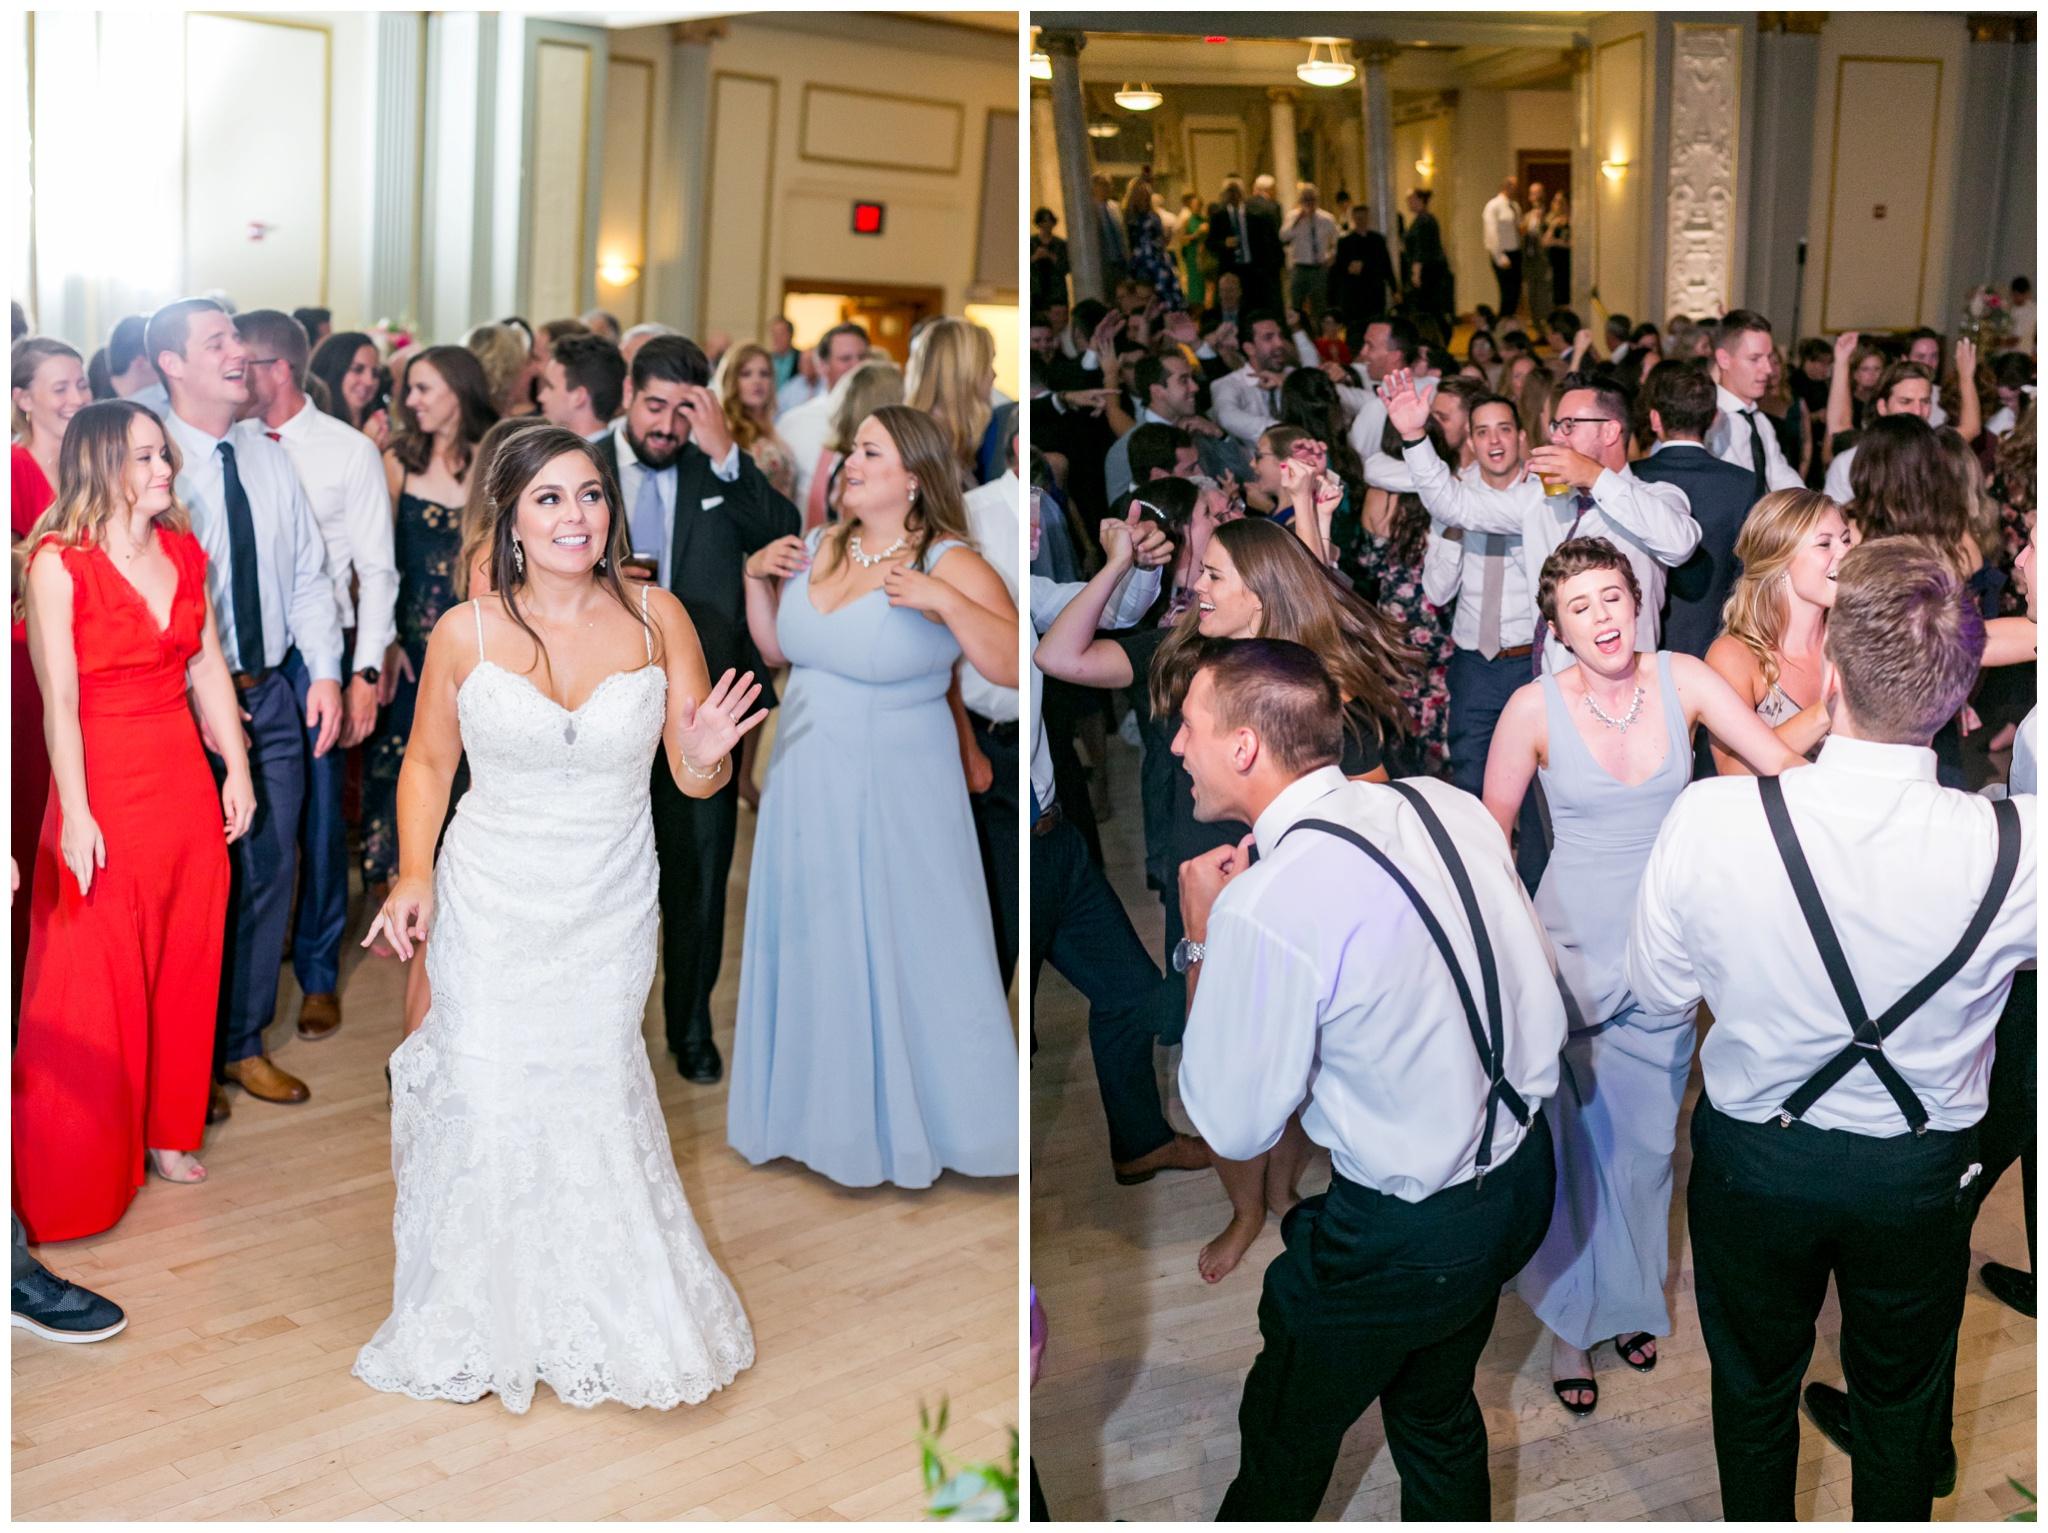 UW_Memorial_Union_wedding_madison_wisconsin_wedding_photographers_4655.jpg